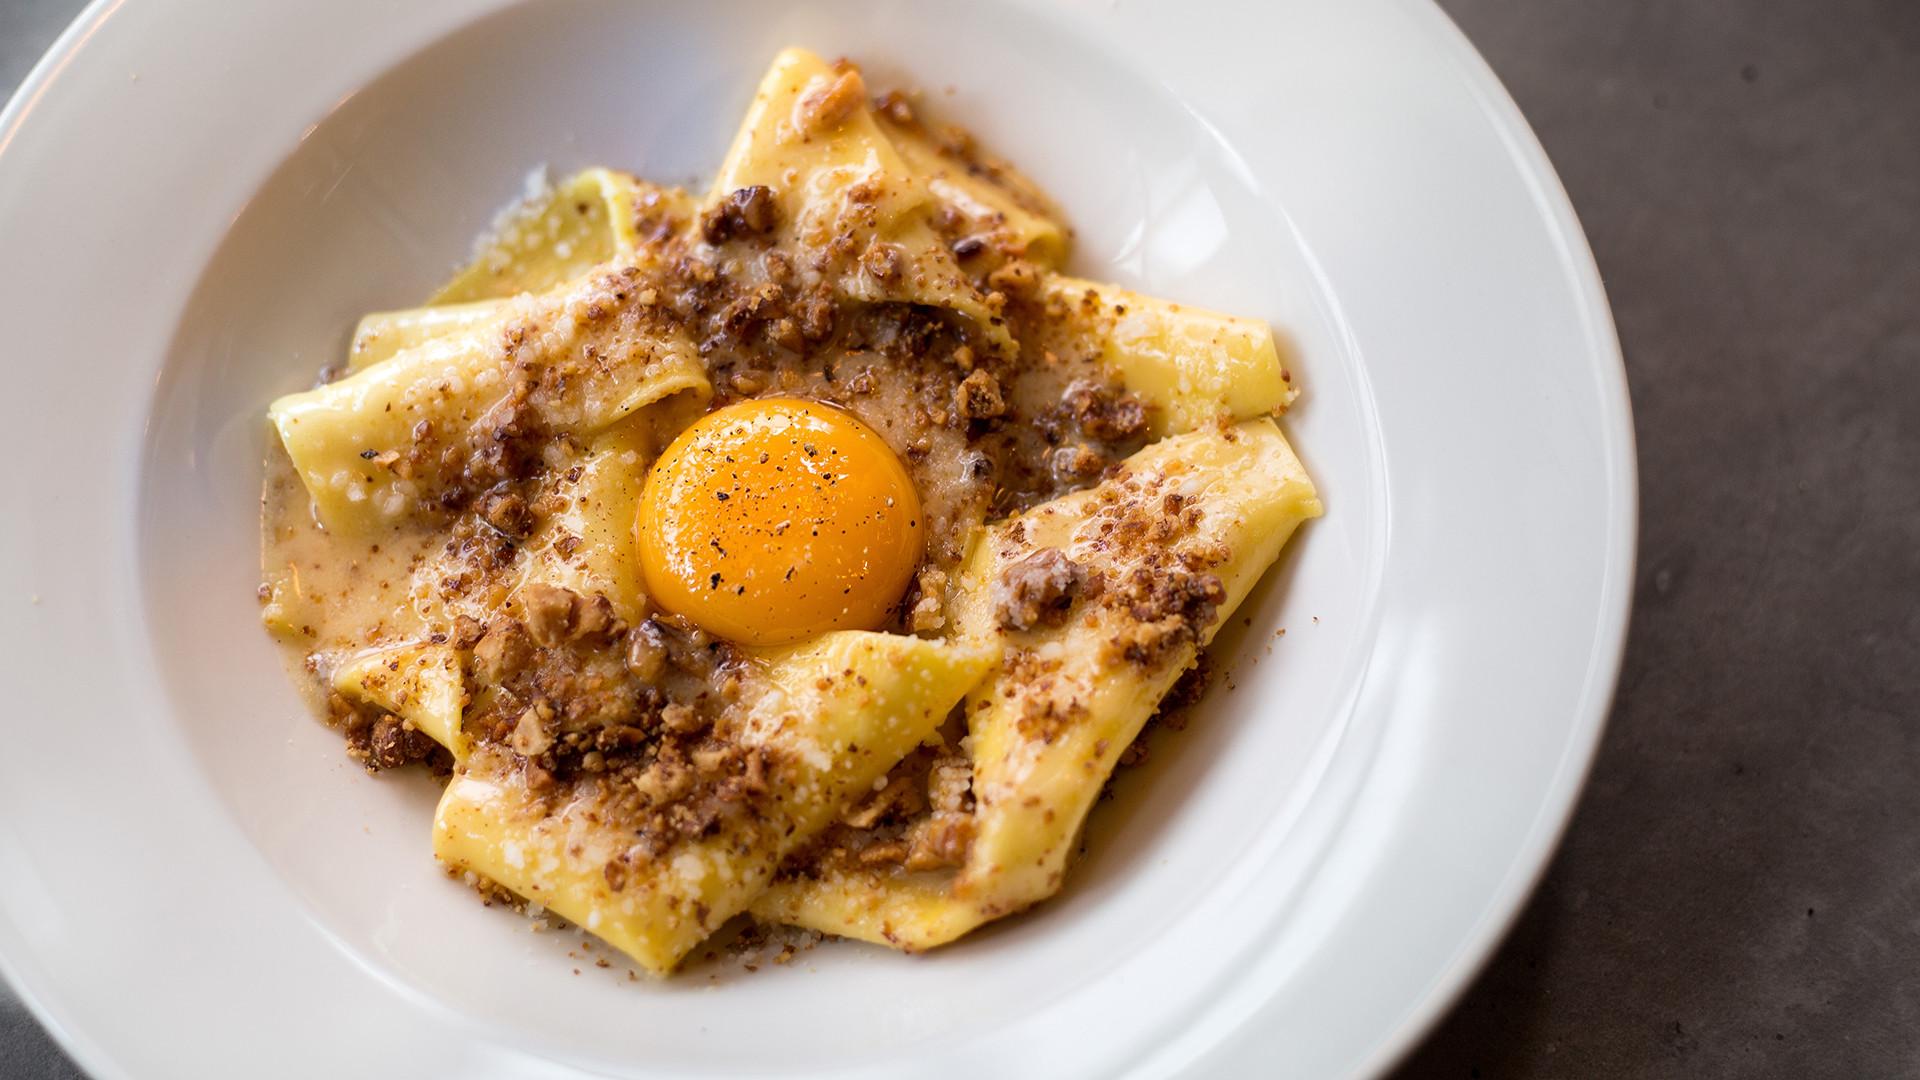 Best pasta restaurants in London – Bancone